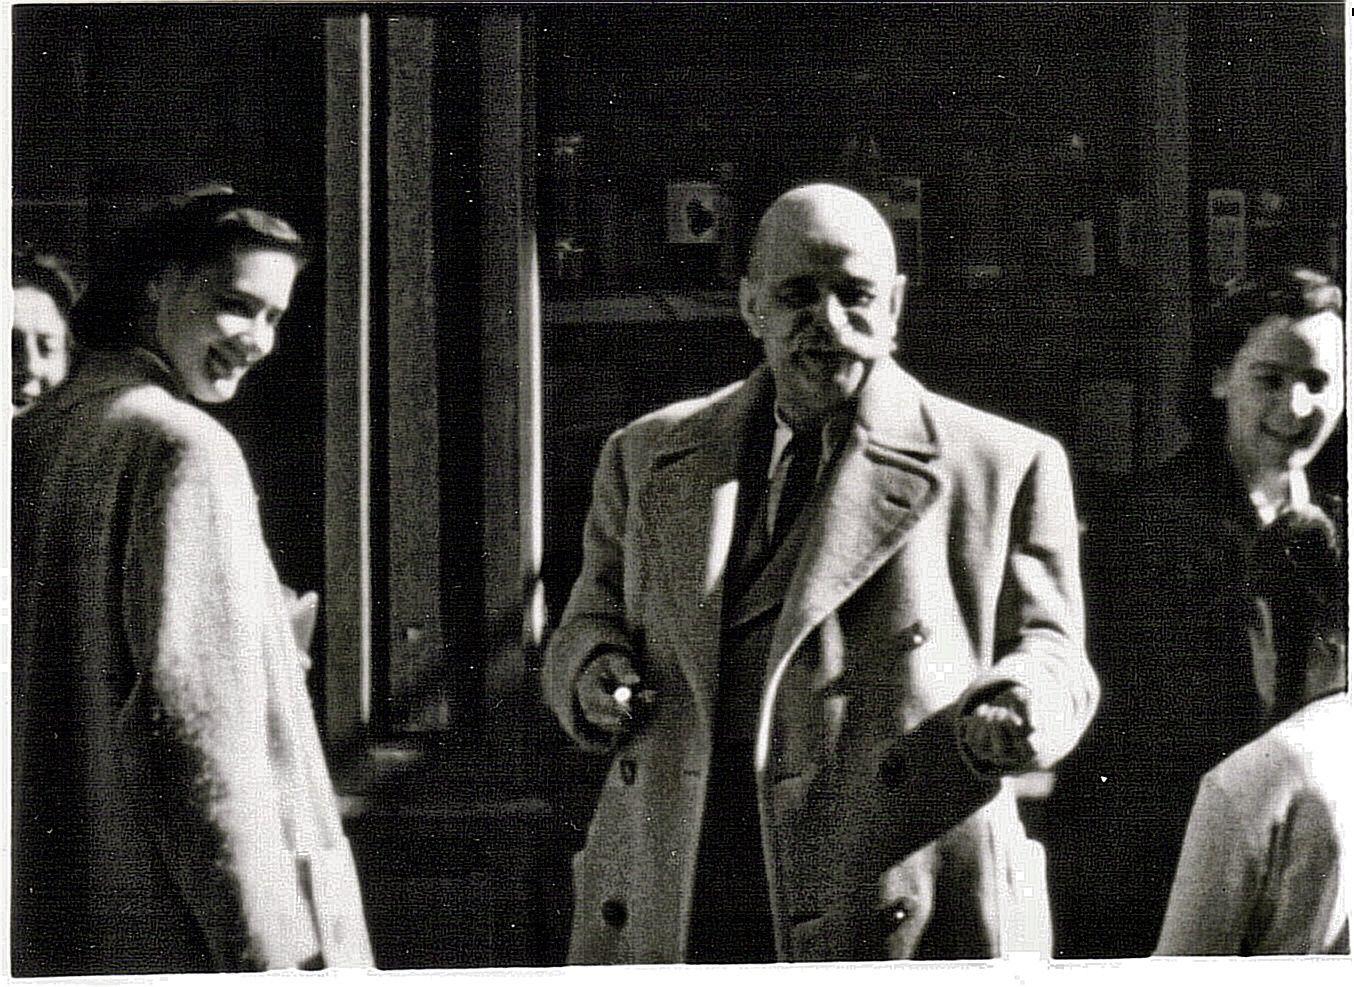 George Ivanovich Gurdjieff (January 13, 1877? – October 29, 1949